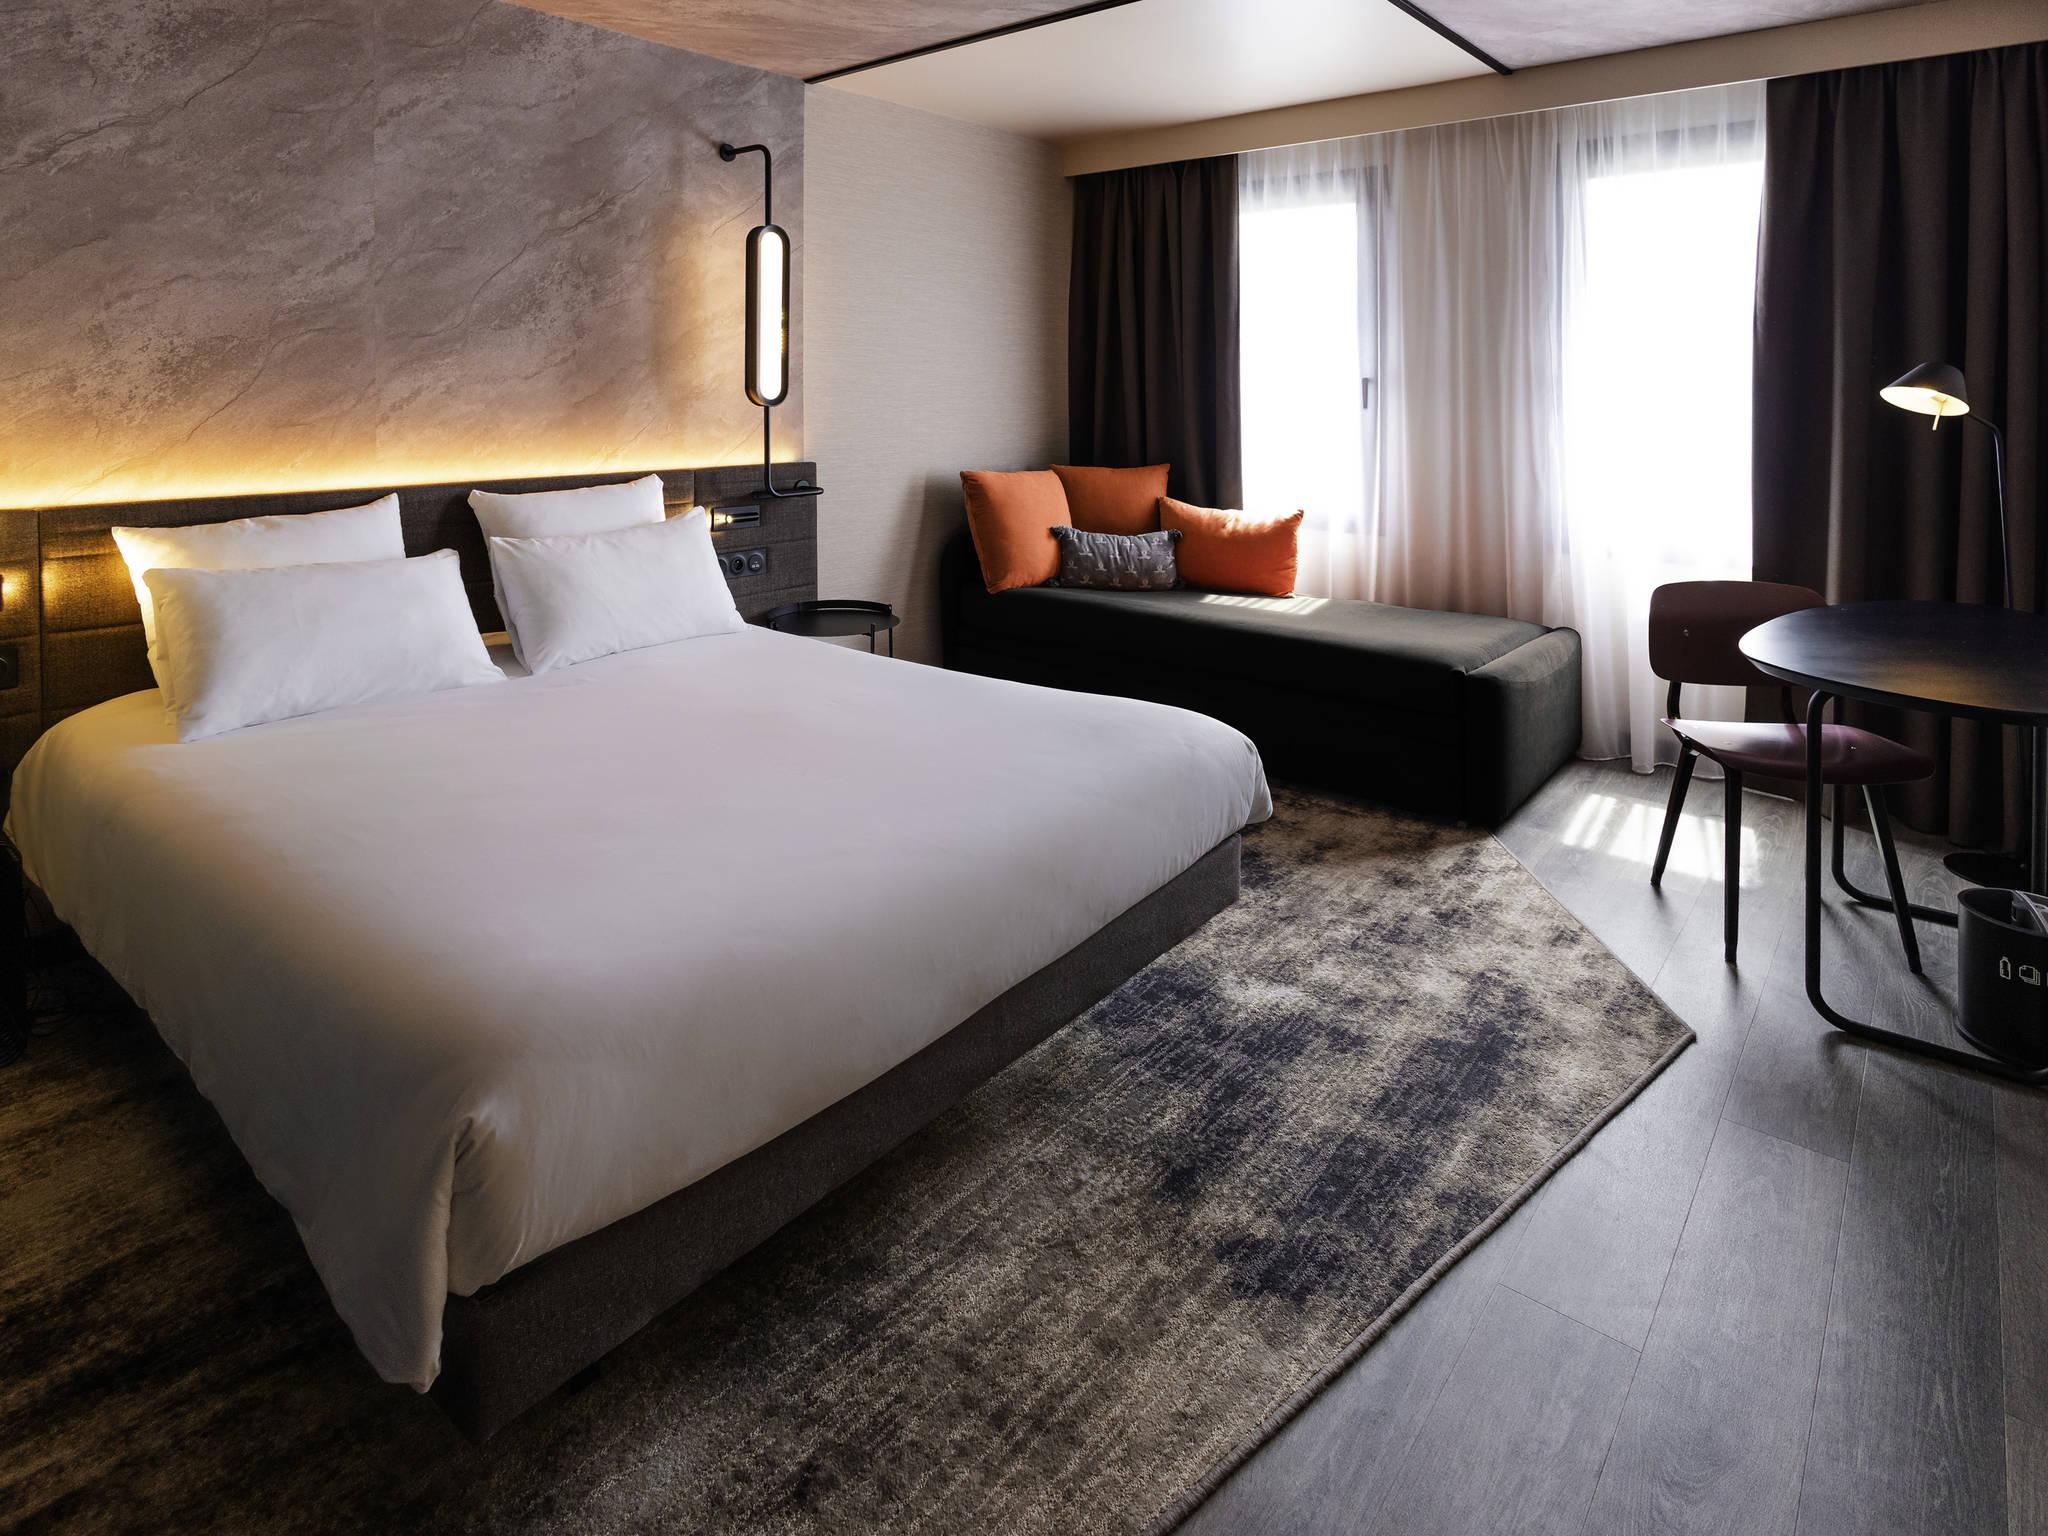 Hotel – Novotel Paris Suresnes Longchamp